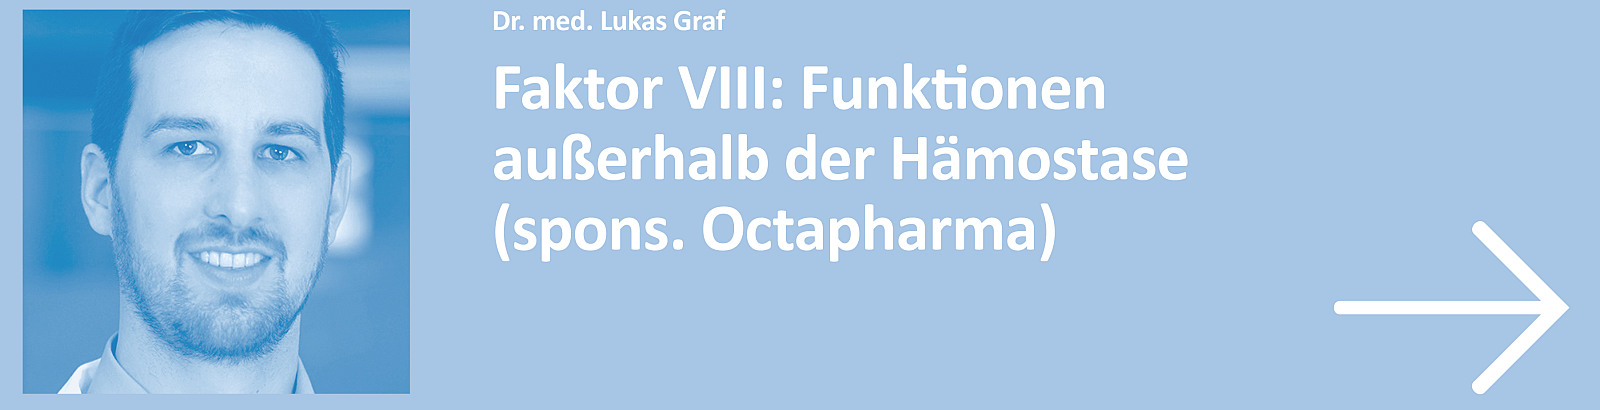 Beitrag L Graf_1600x410